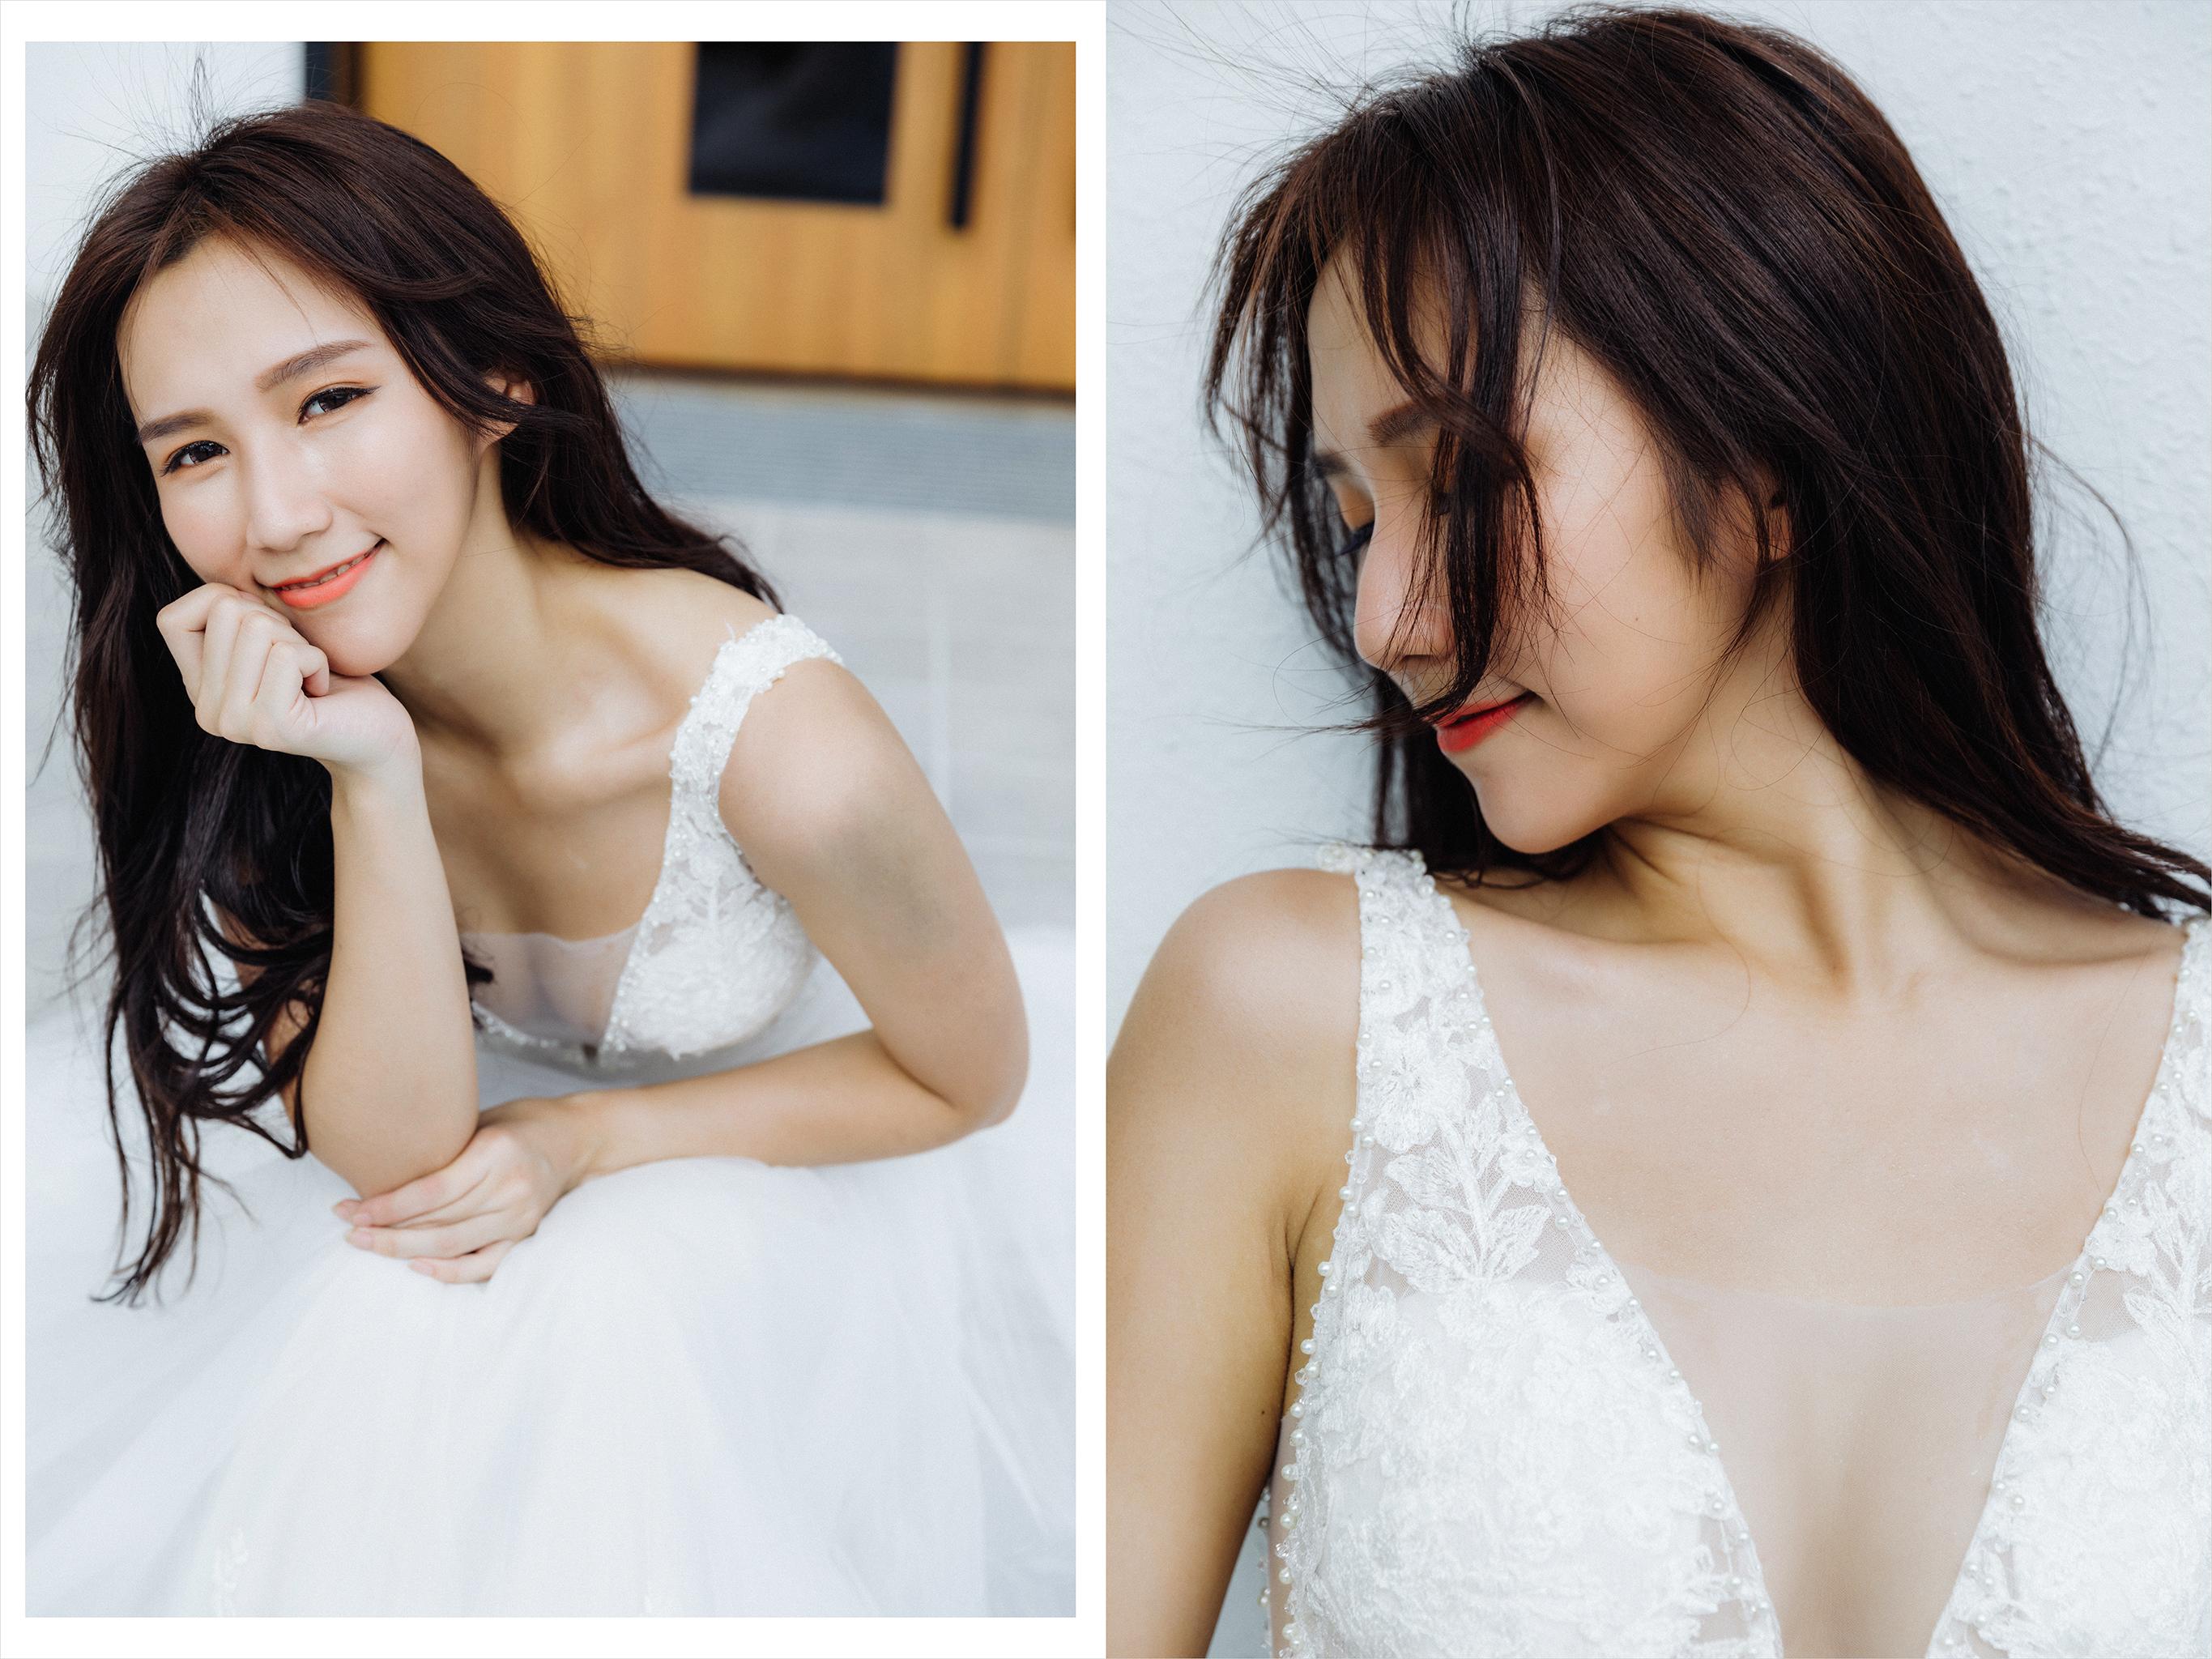 48592335032 b1bcab7a4b o - 【自主婚紗】+Ying&Wiwi+